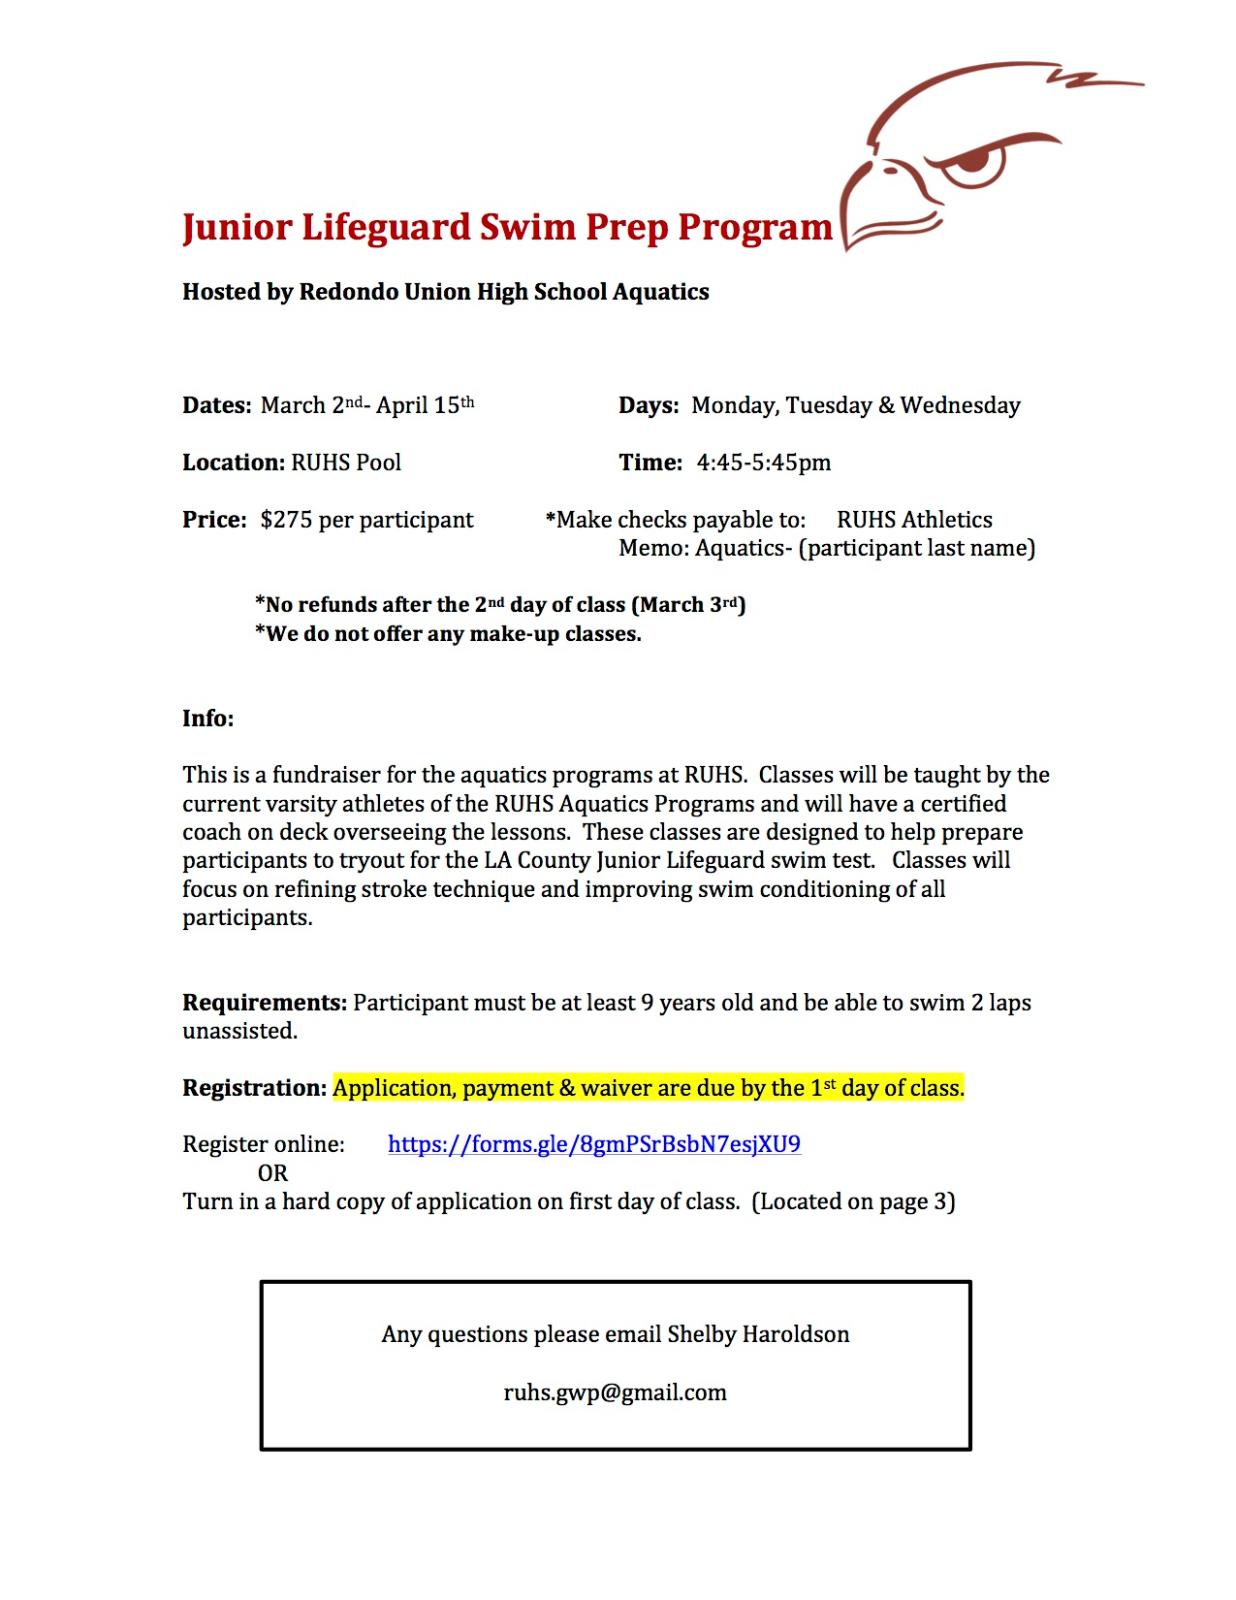 Junior Lifeguard Swim Prep Program